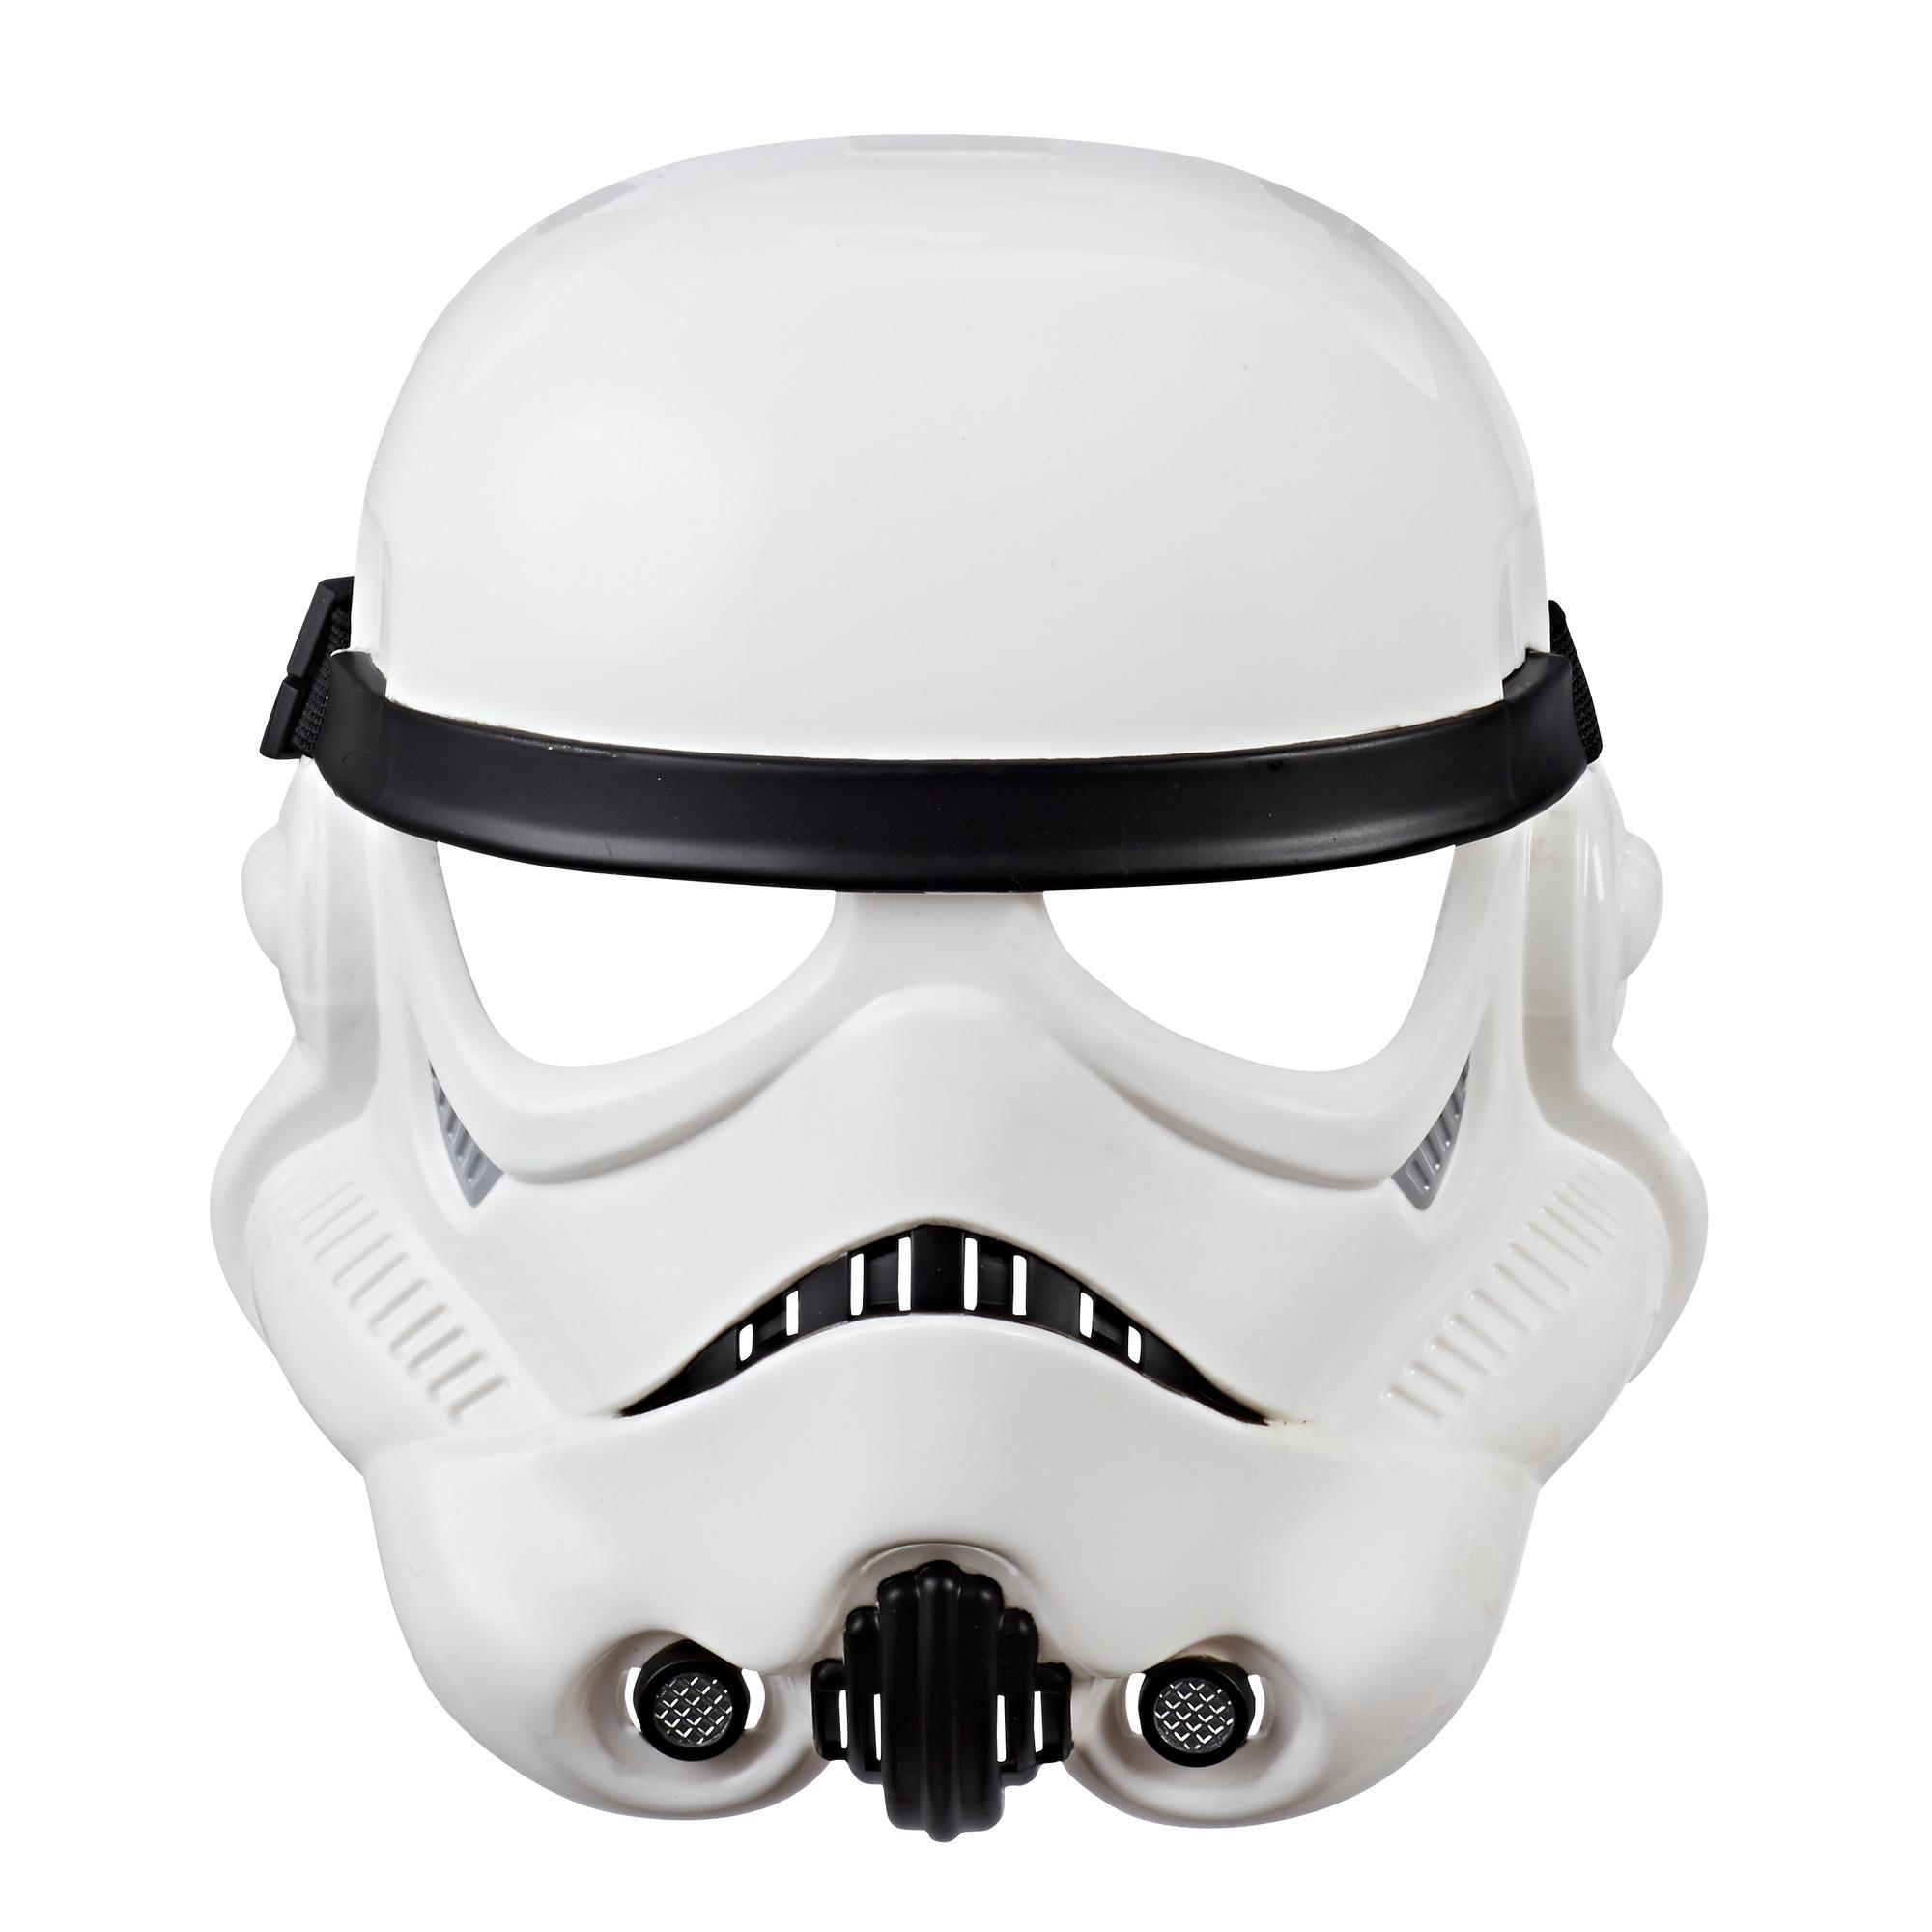 Star Wars - Stormtrooper, maschera role play (Galaxy of Adventures)